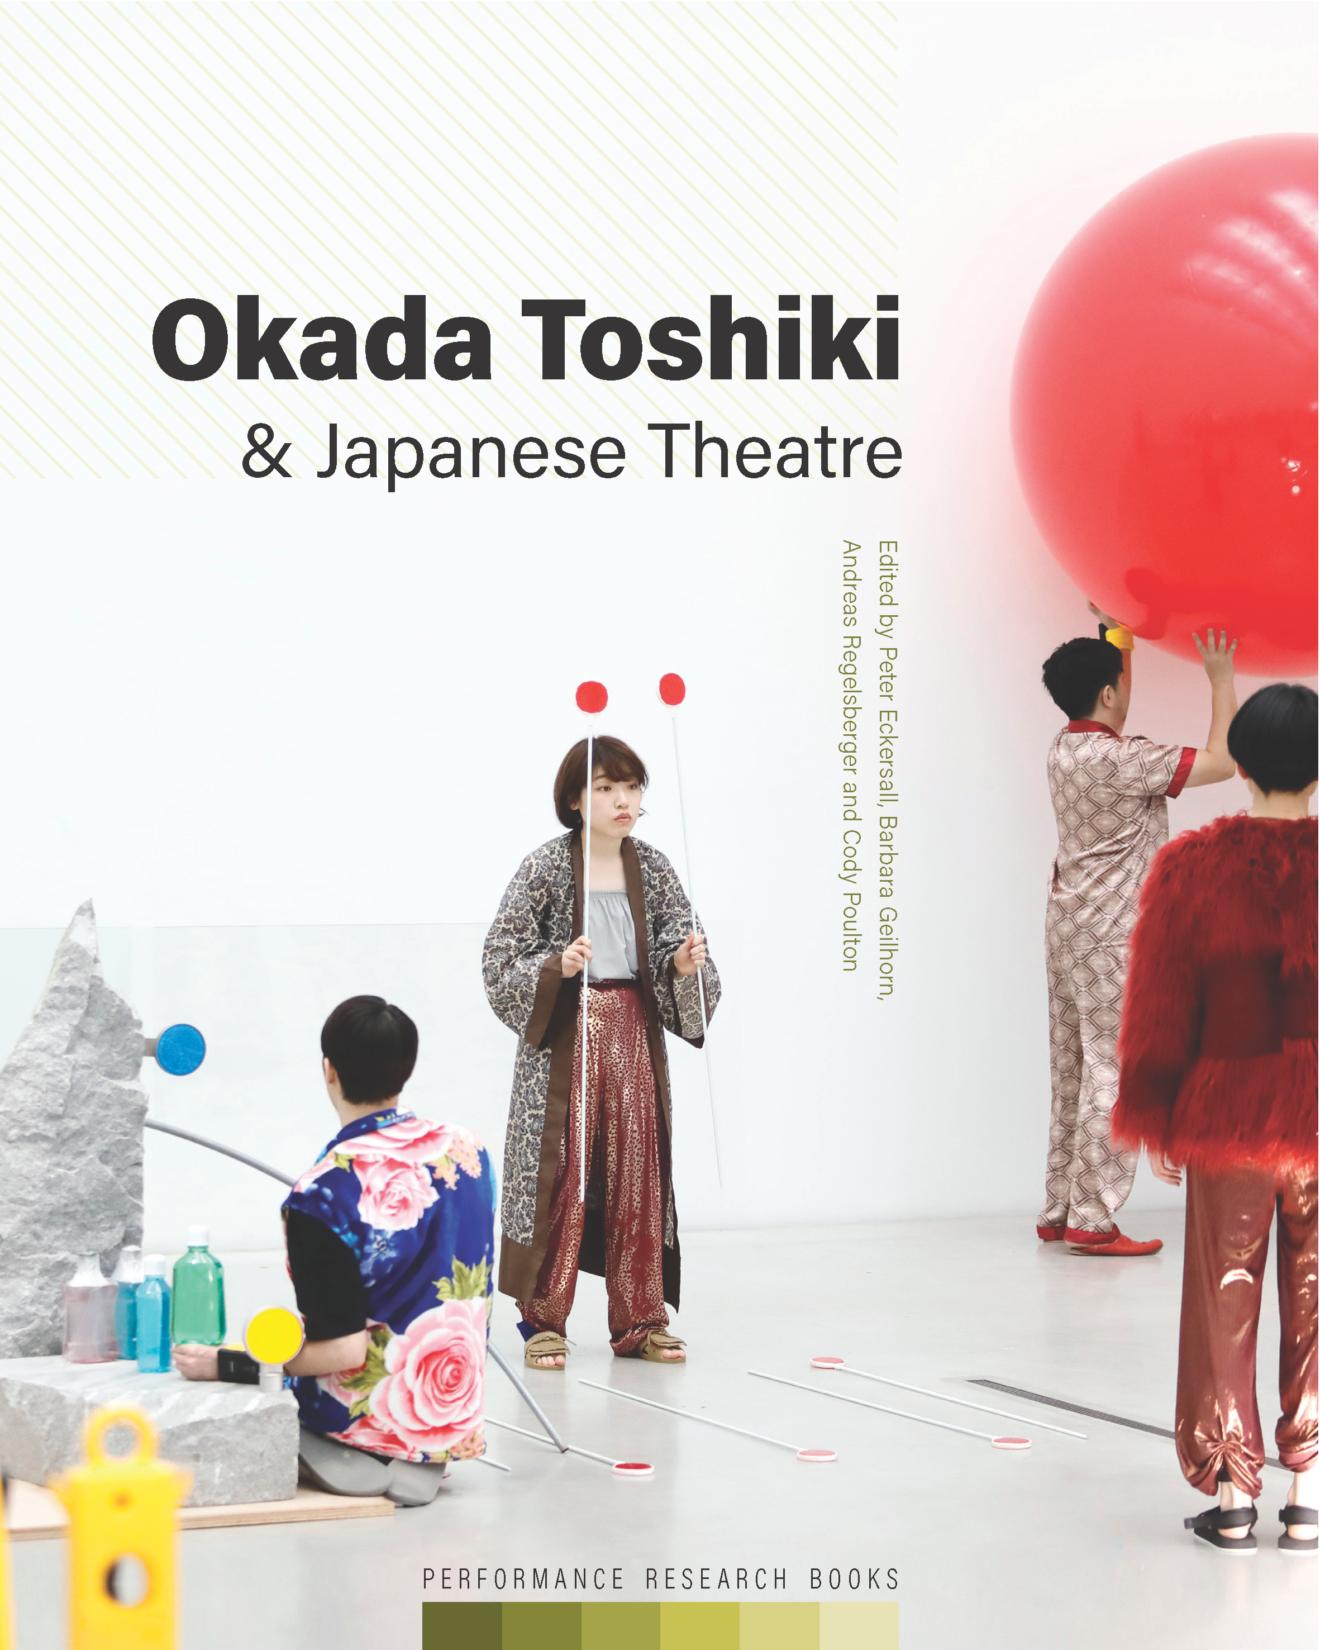 book cover Okada Toshiki 03 05 2021 geilhorn